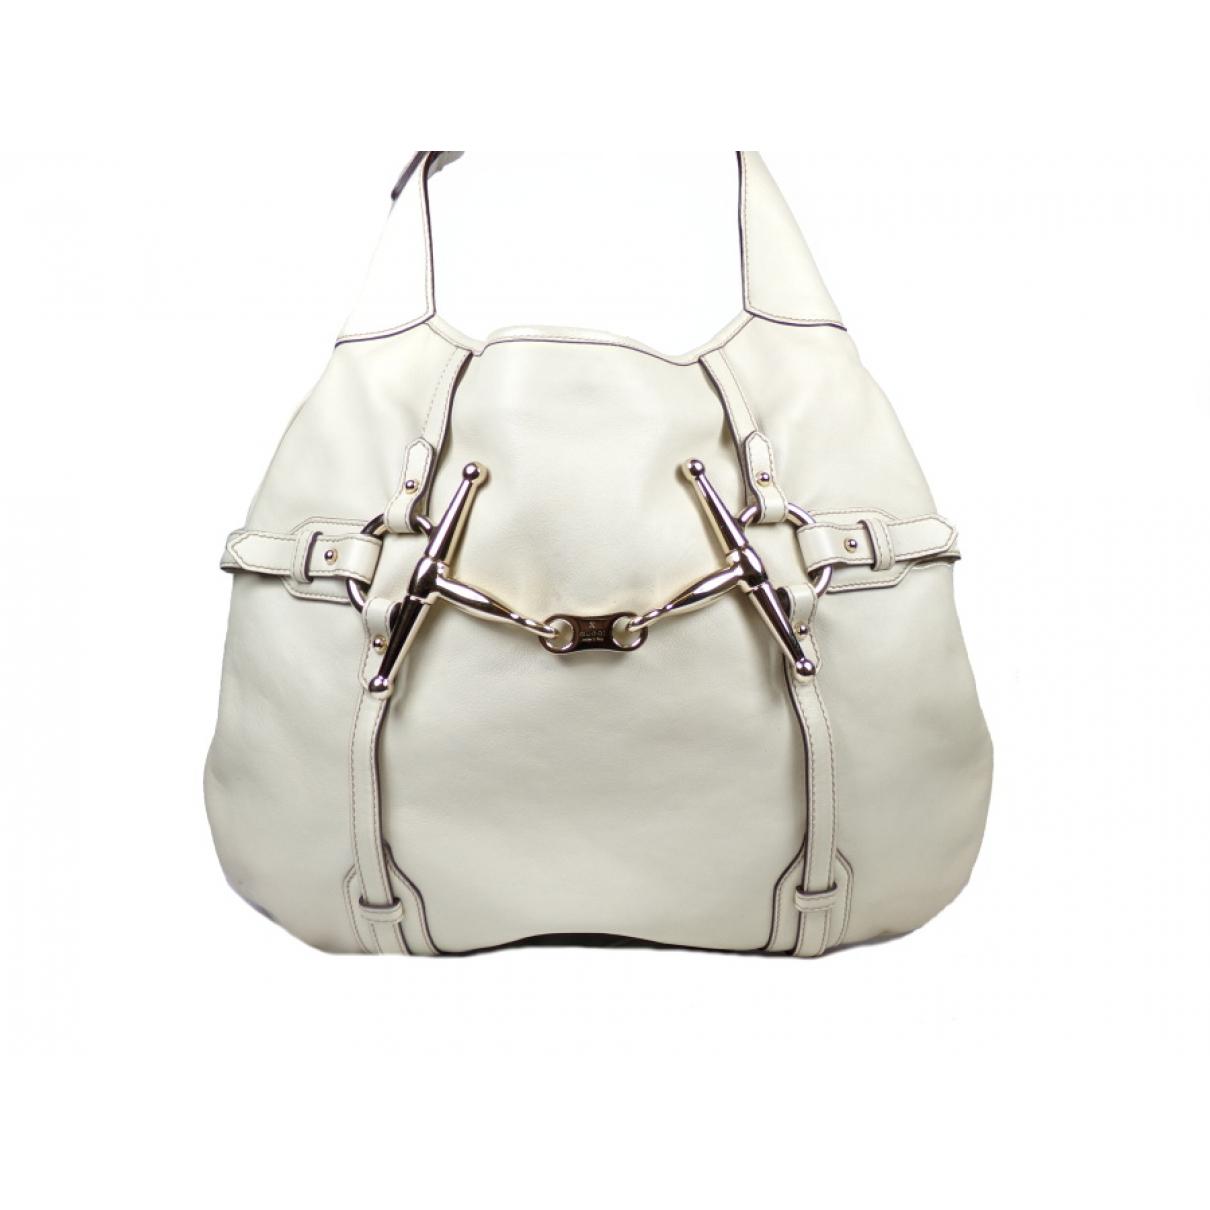 Gucci \N Handtasche in  Beige Leder